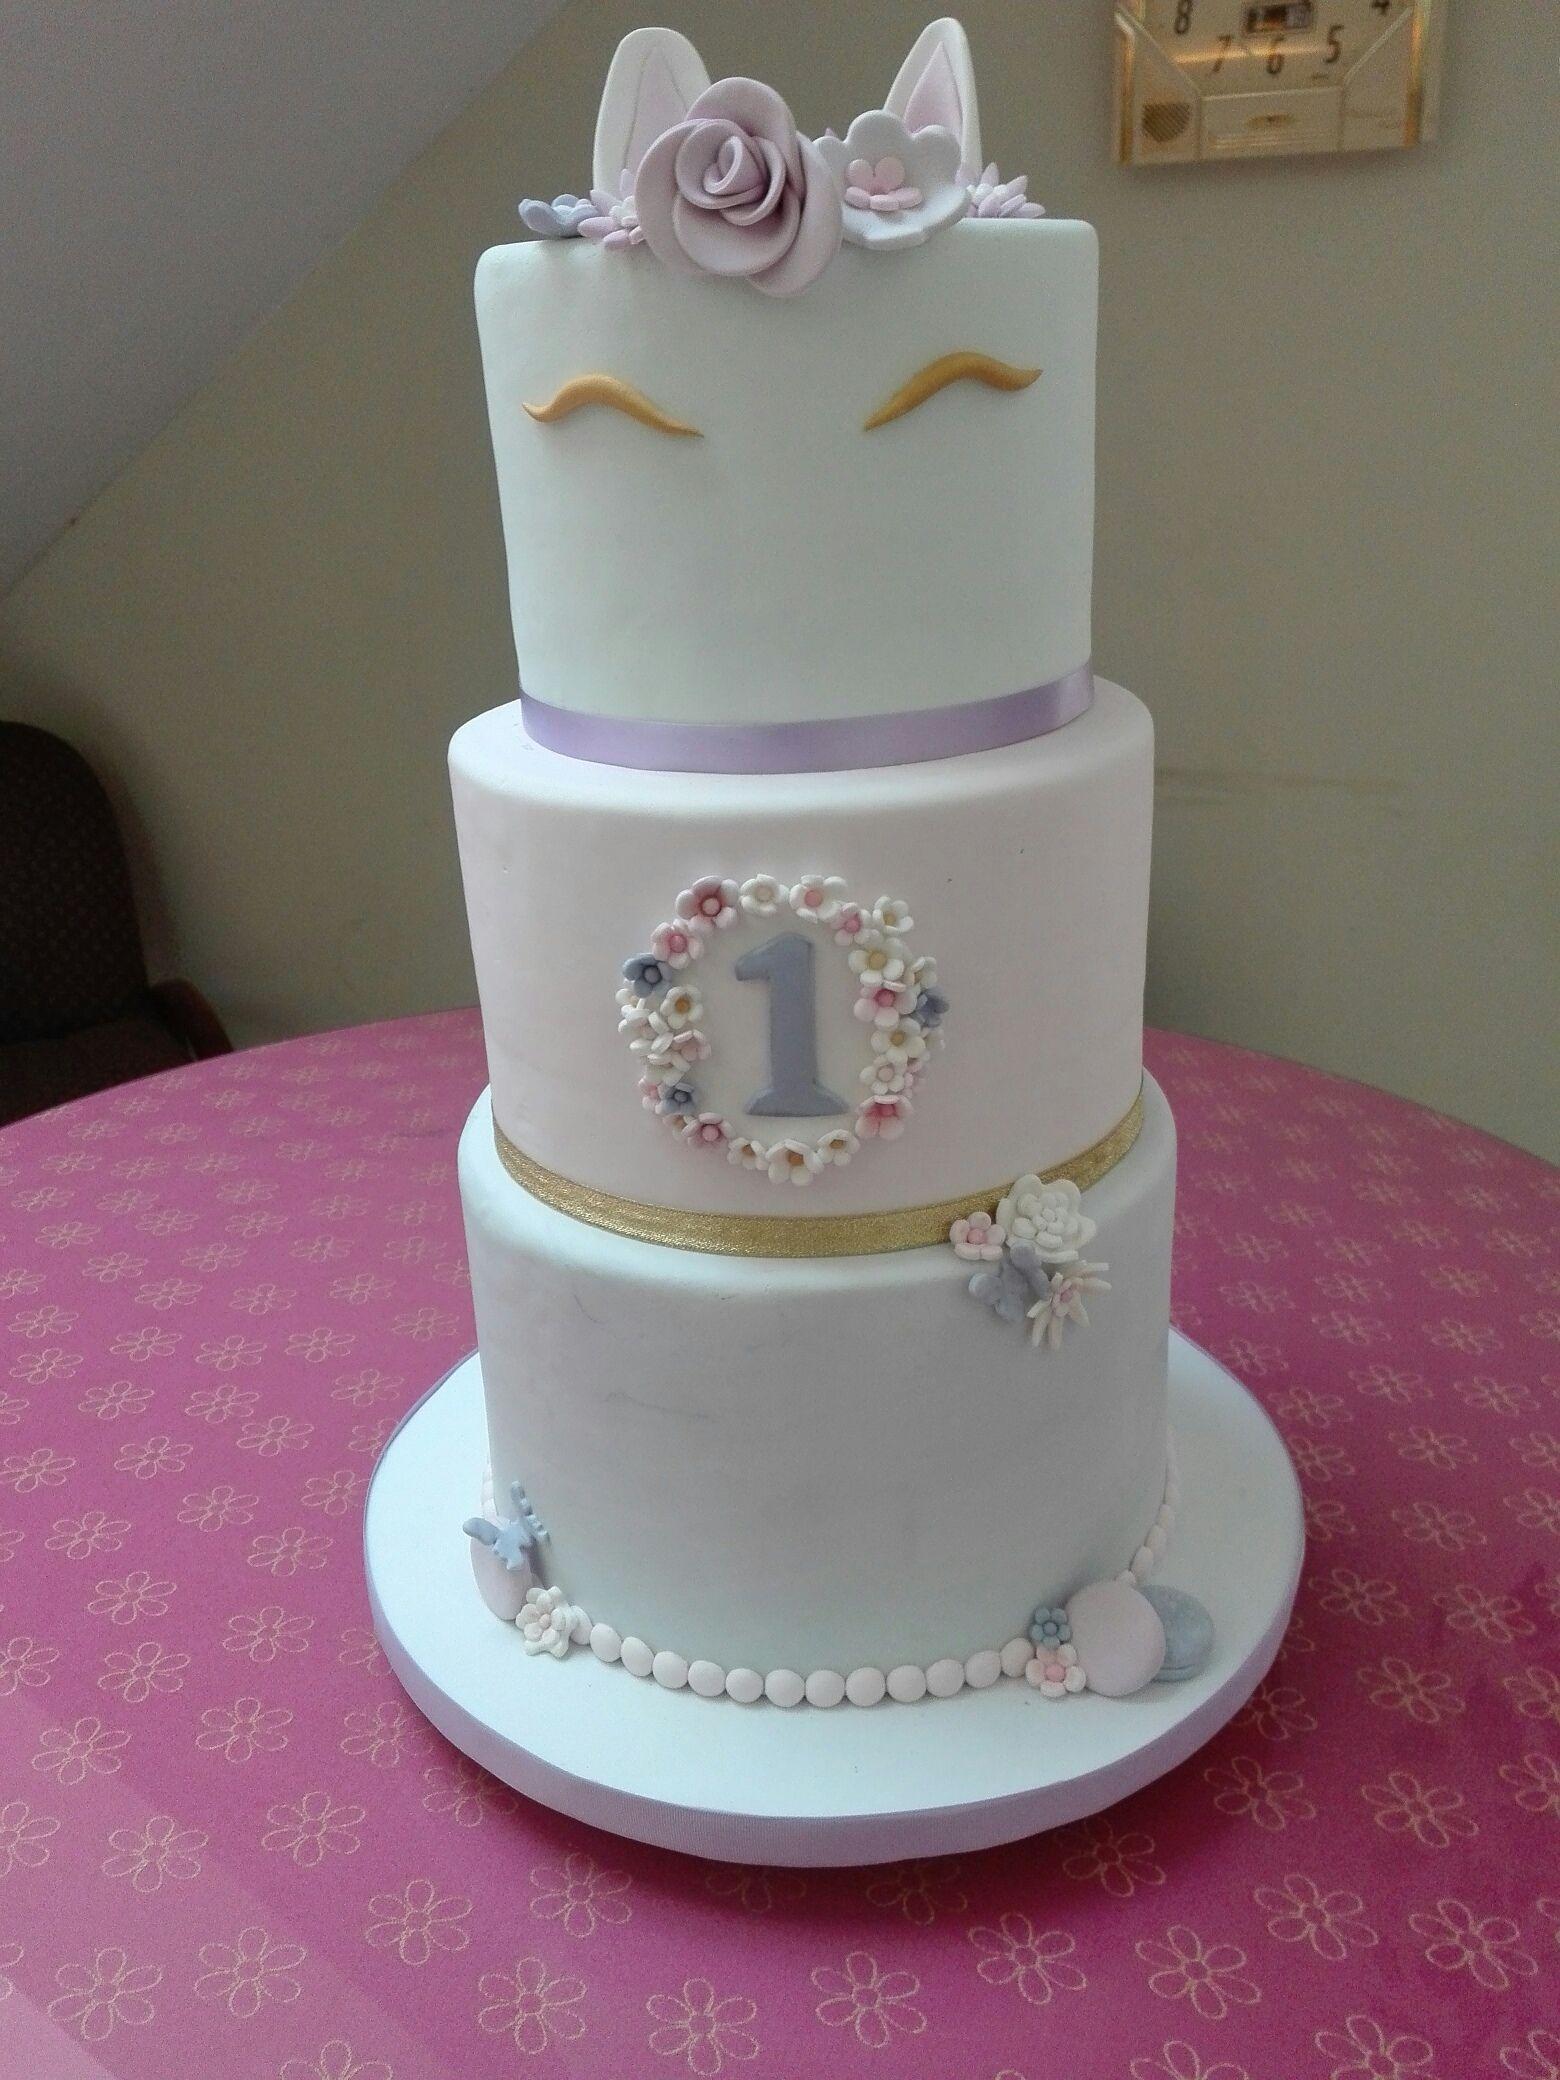 Unicorn Fondant Cake For My Granddaughter Olivia On Her 1st Birthday